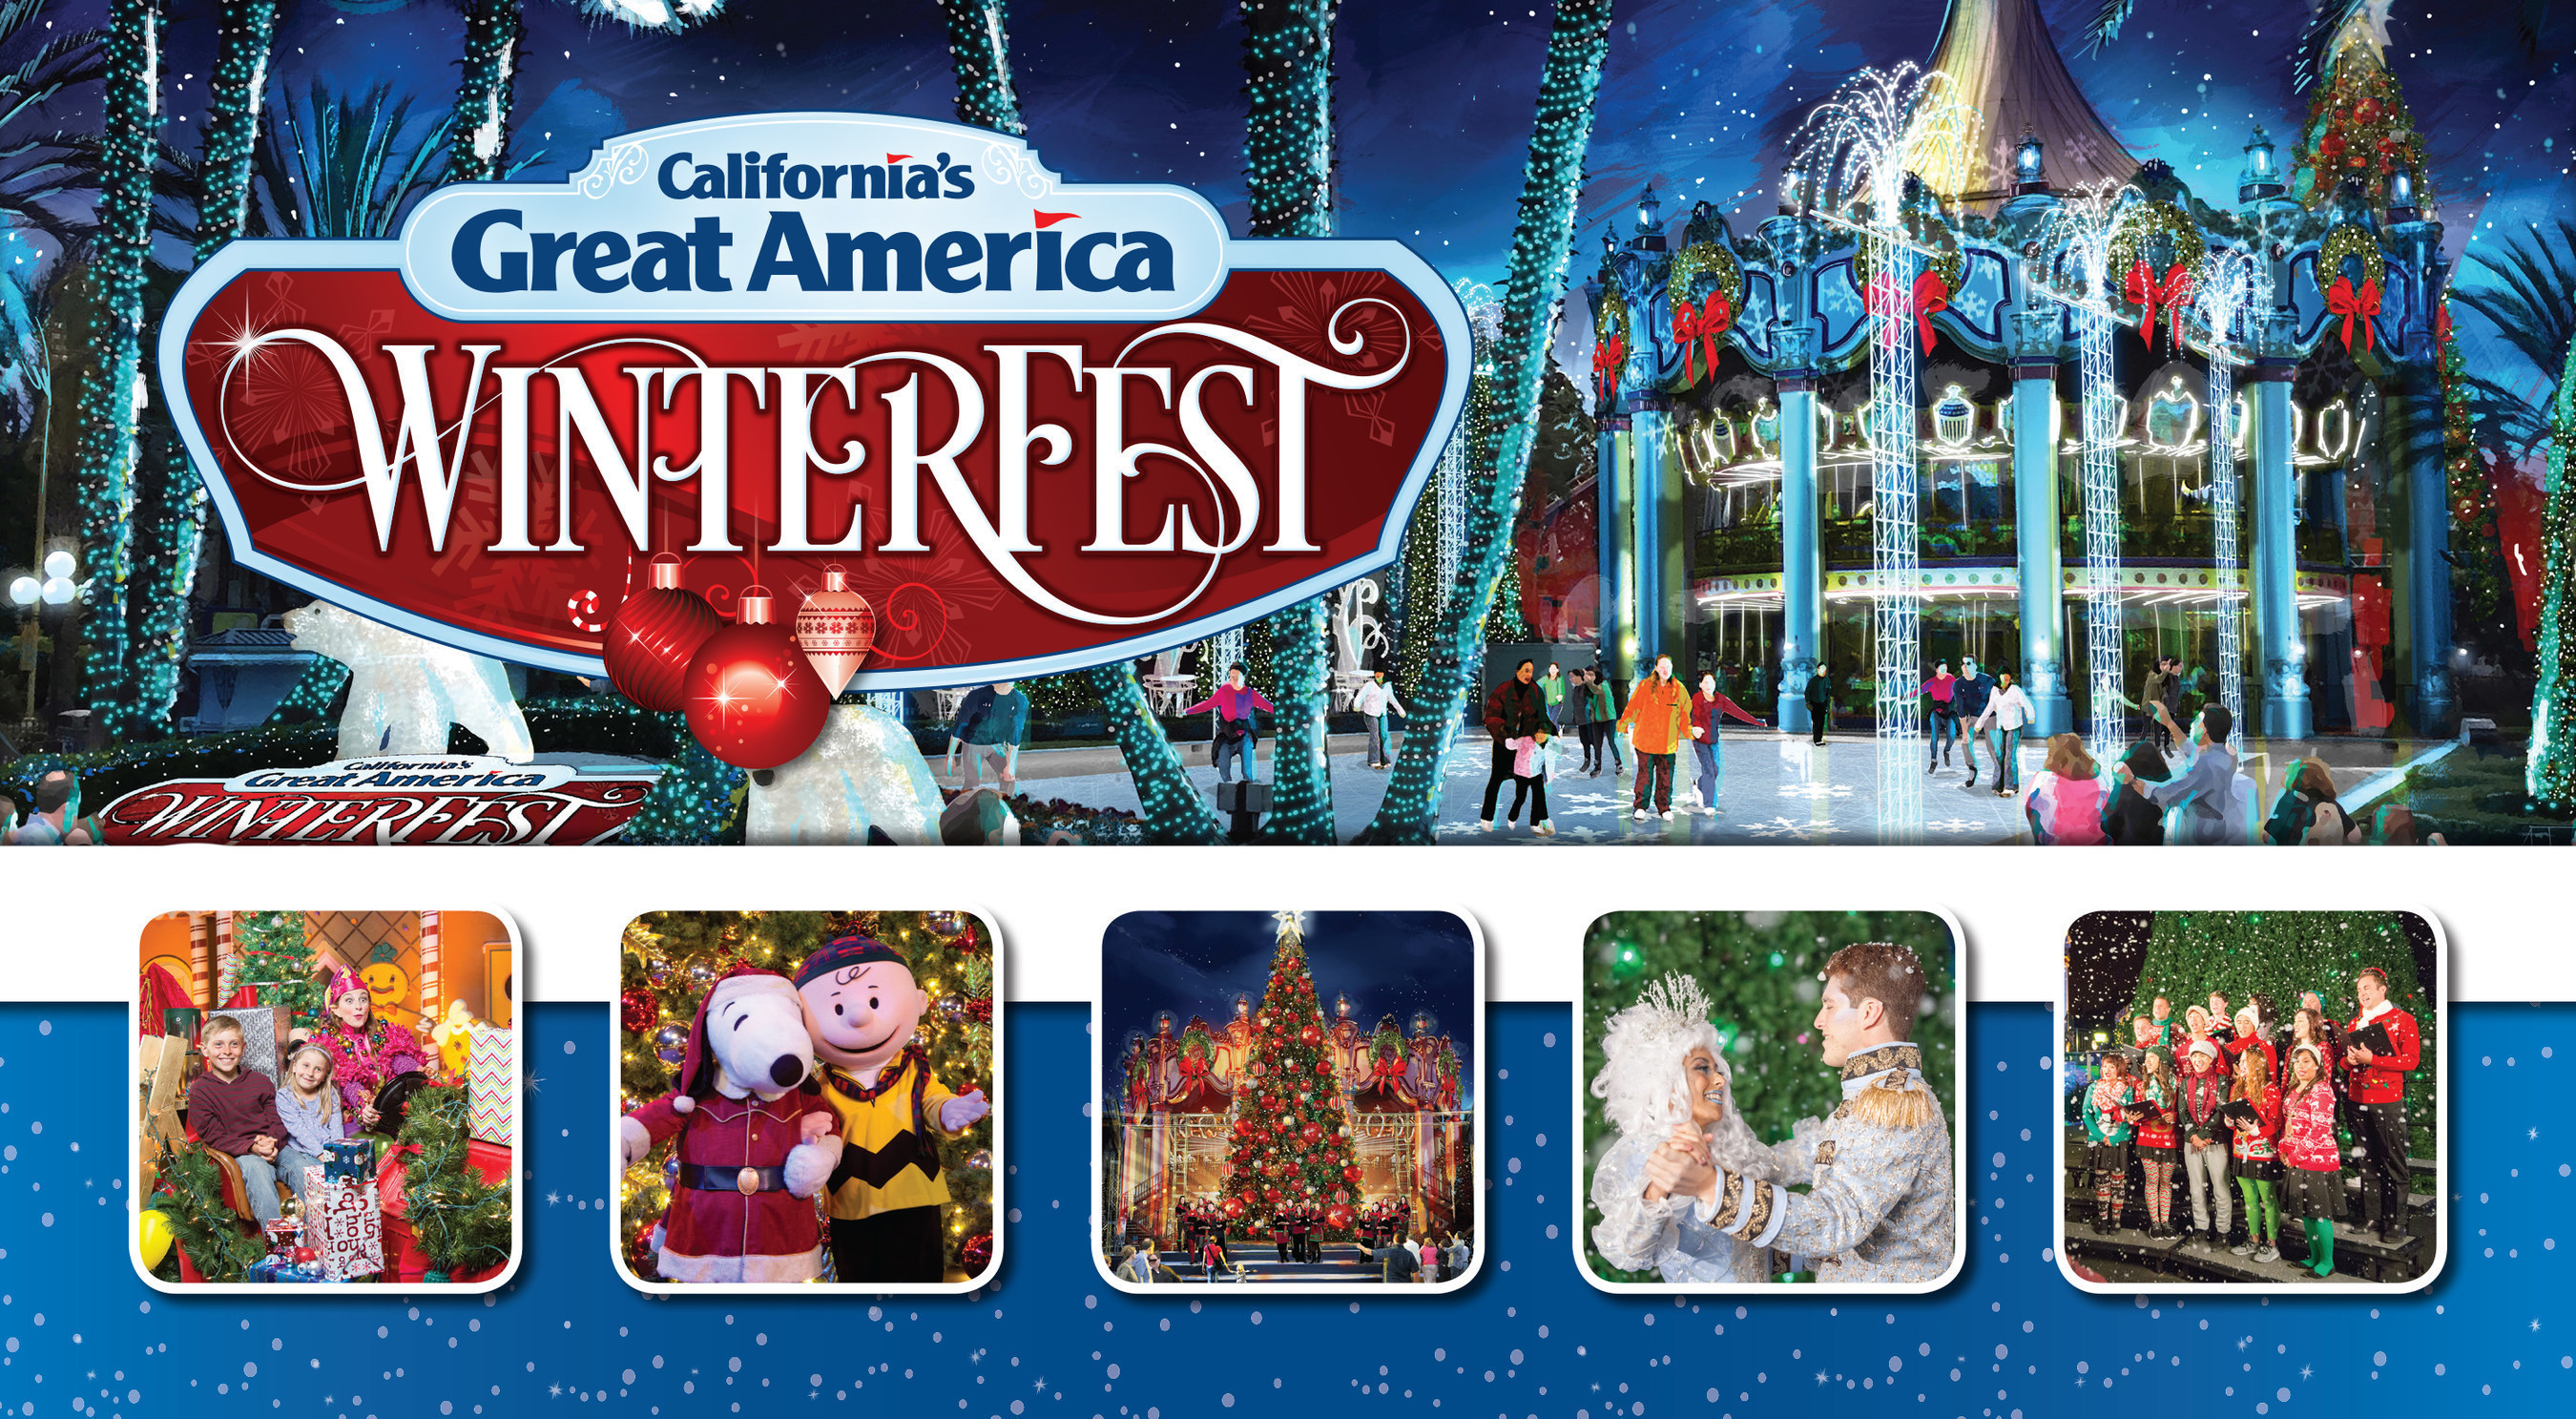 WinterFest at California's Great America in Santa Clara